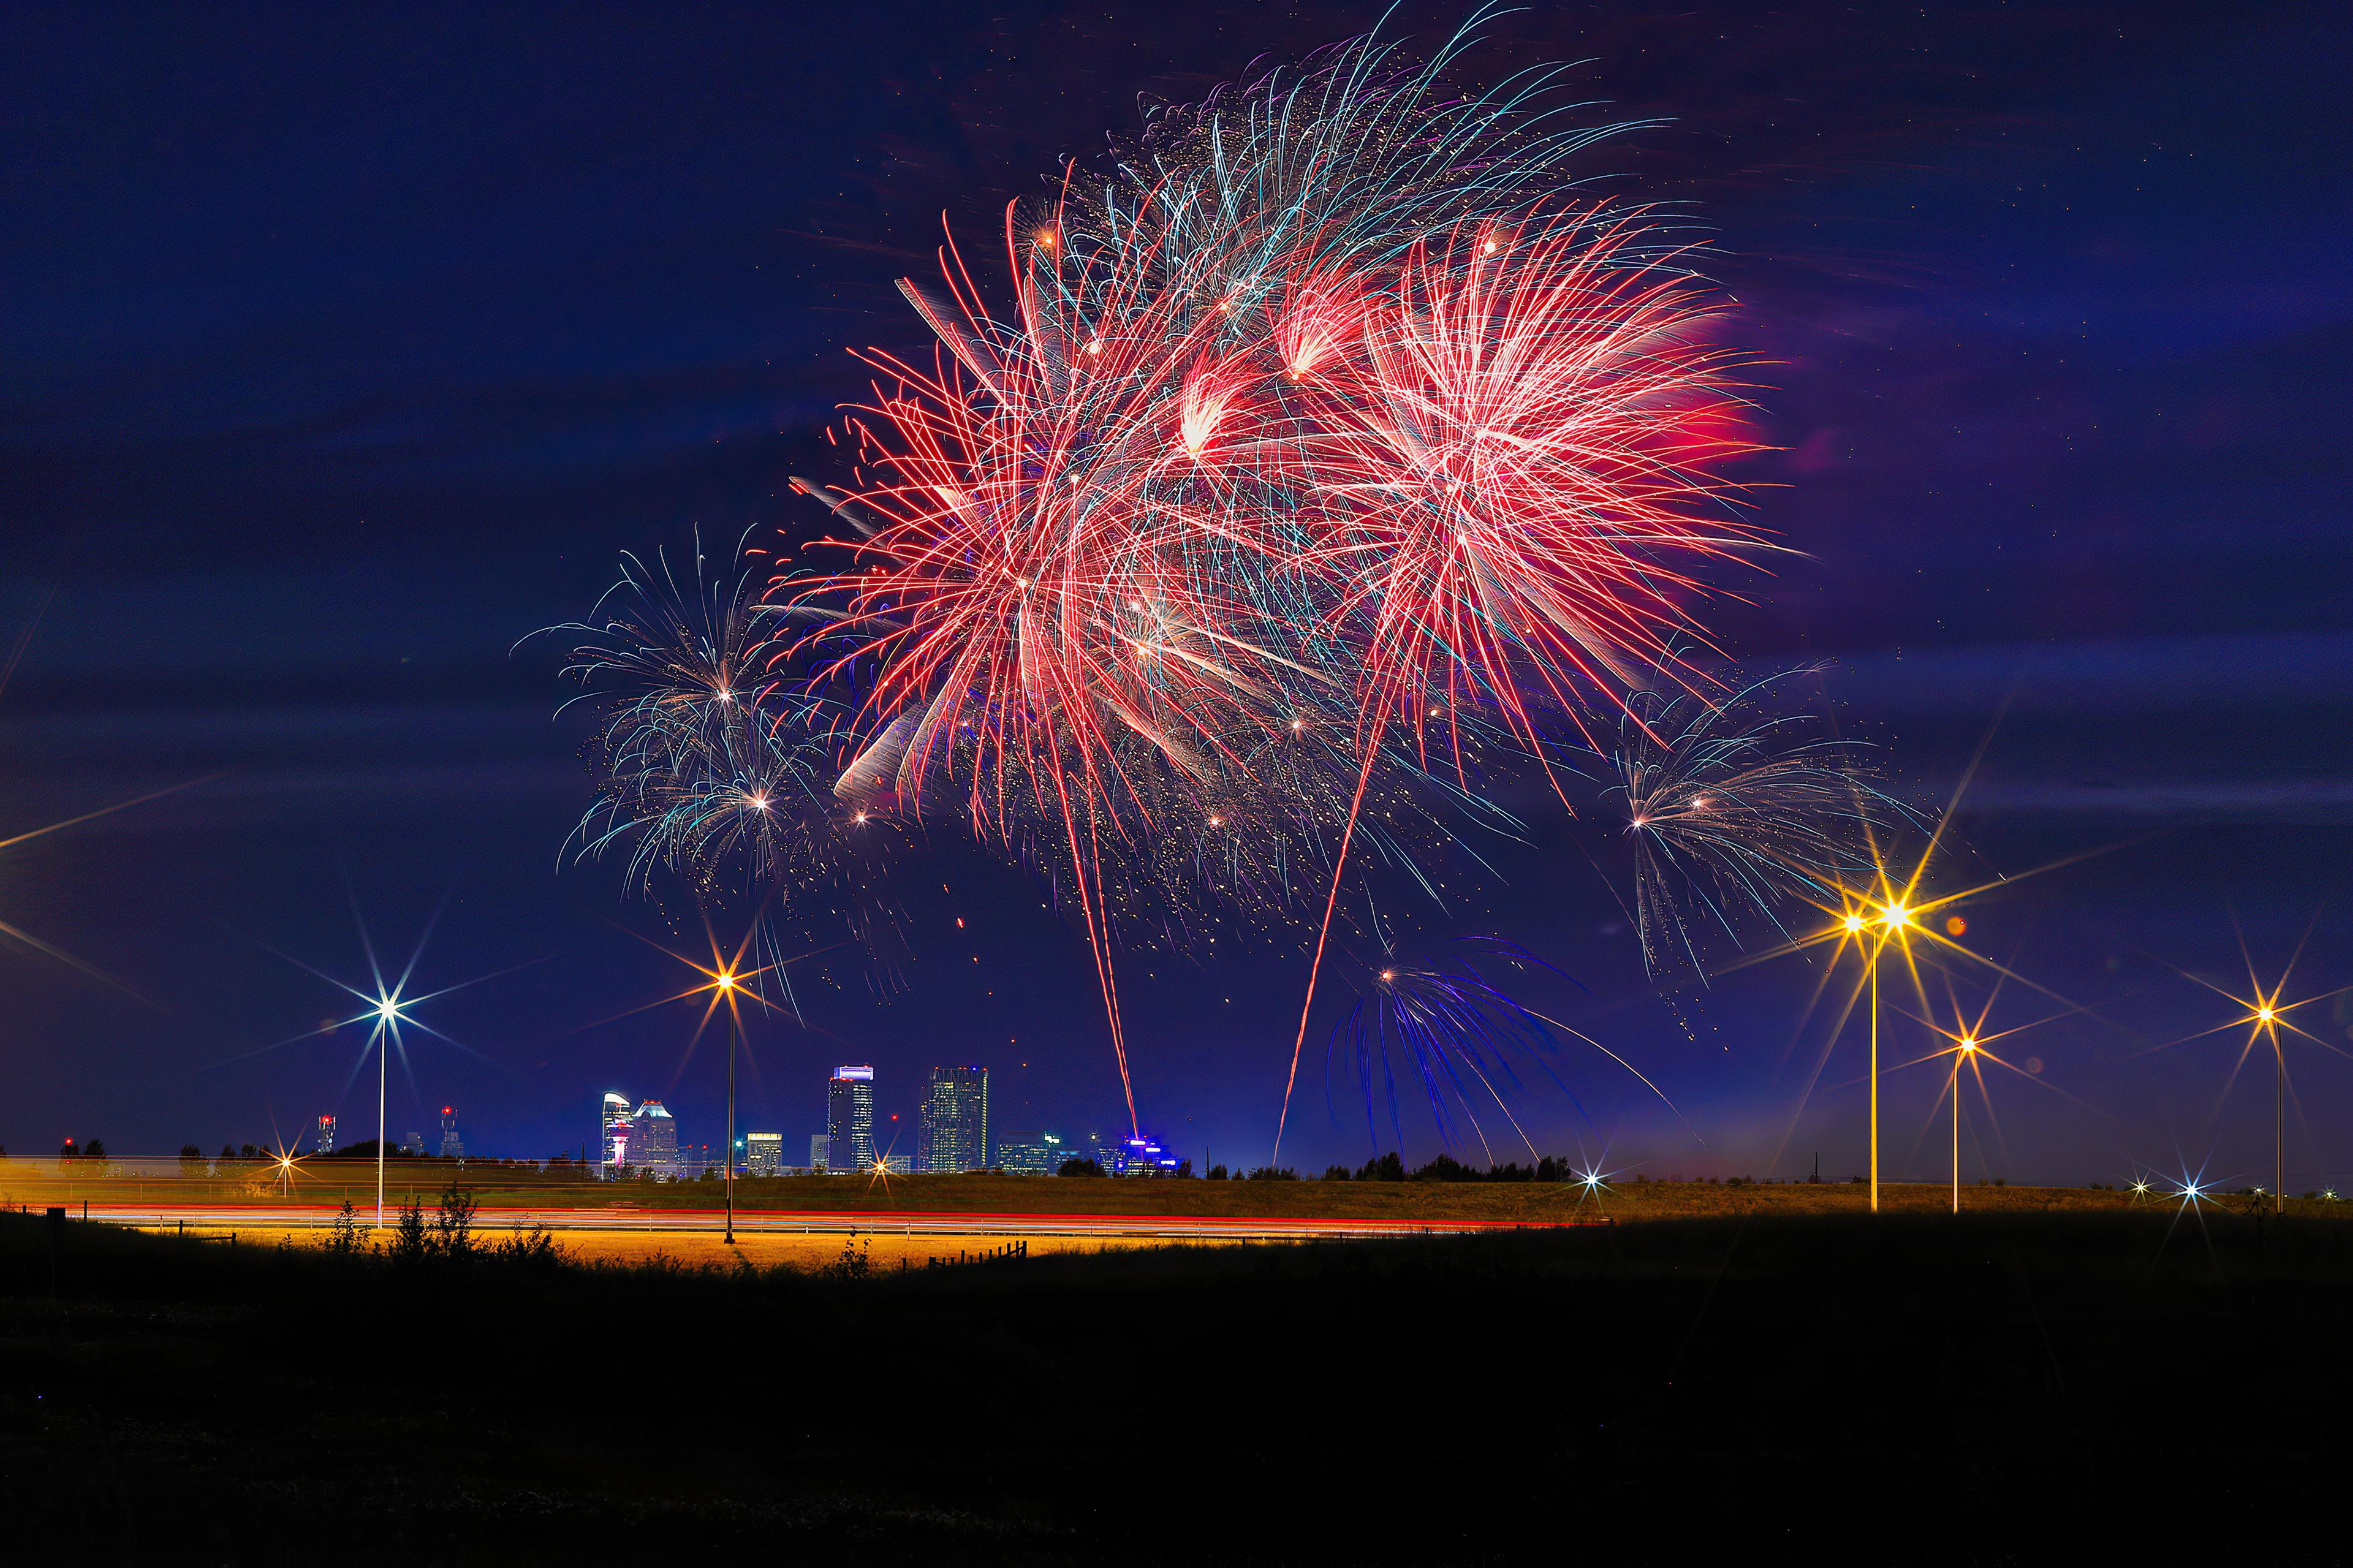 fireworks celebrations 4k 1630612242 - Fireworks Celebrations 4k - Fireworks Celebrations wallpapers, Fireworks Celebrations 4k wallpapers